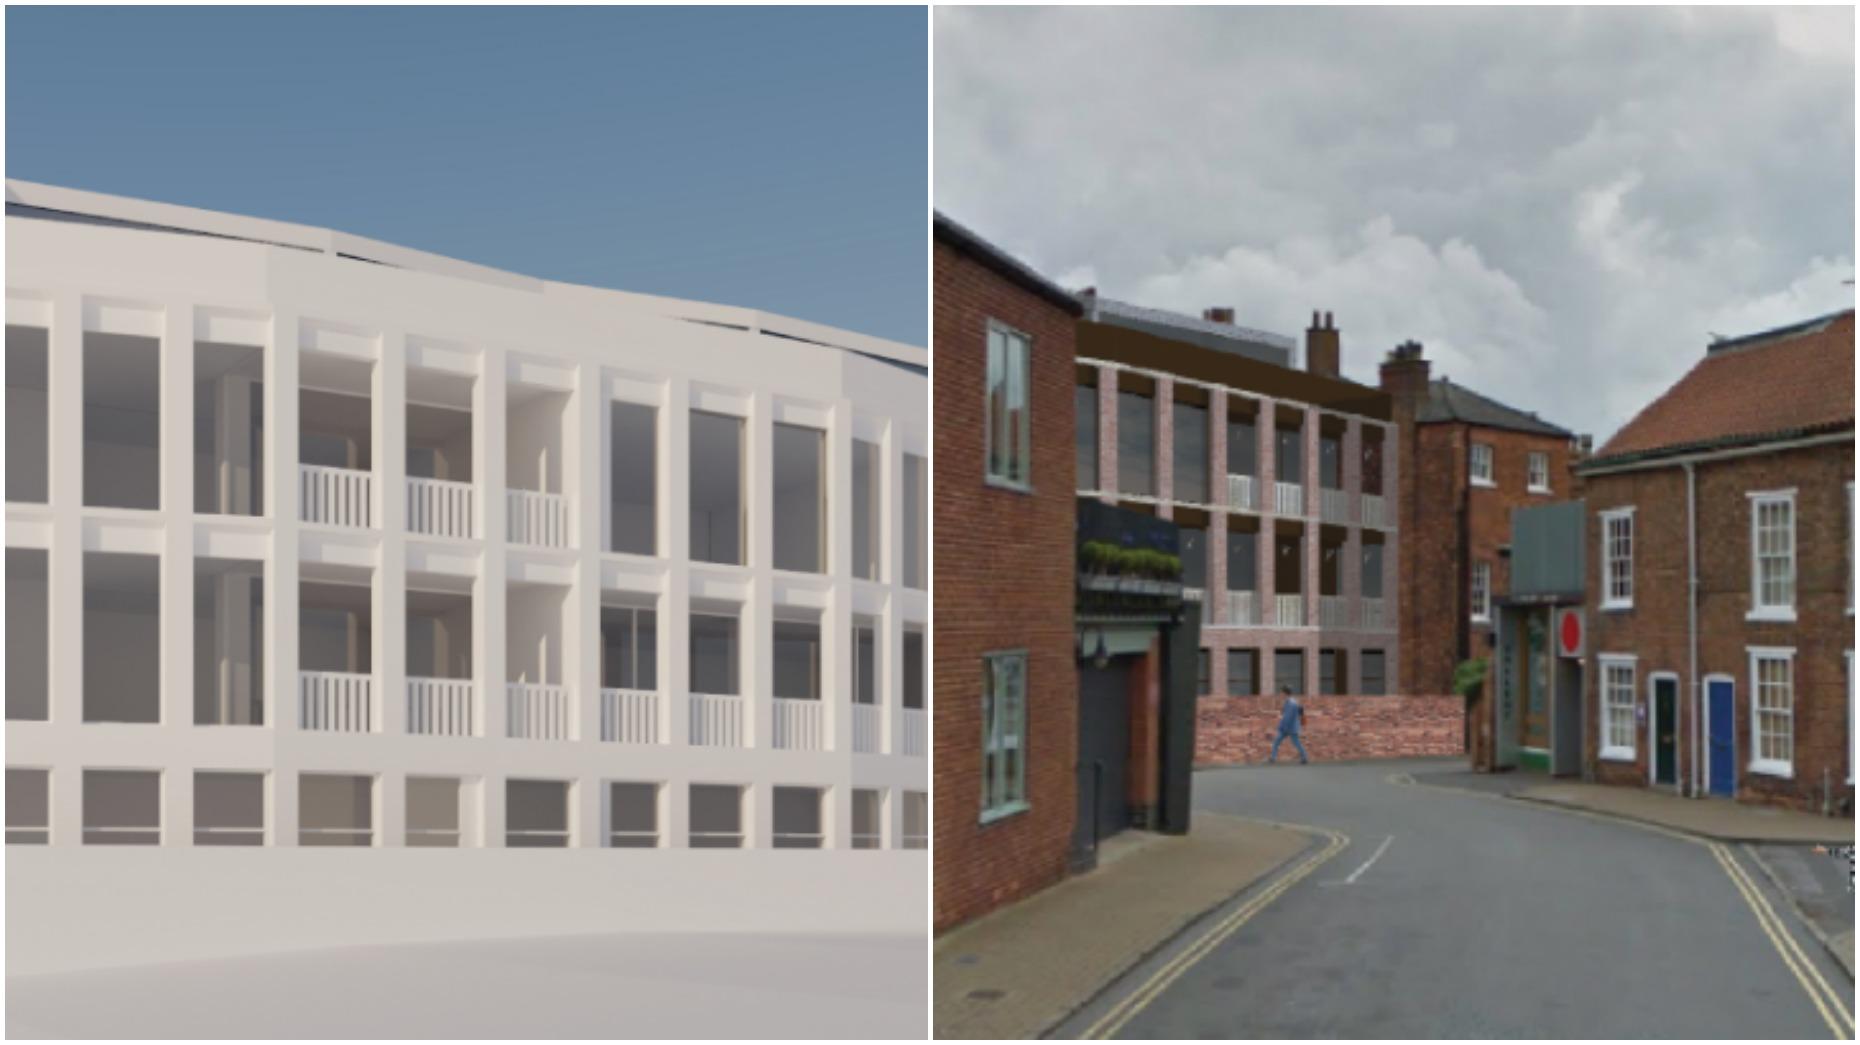 Designs for Chad Varah House: Jonathan Hendry Architects Ltd